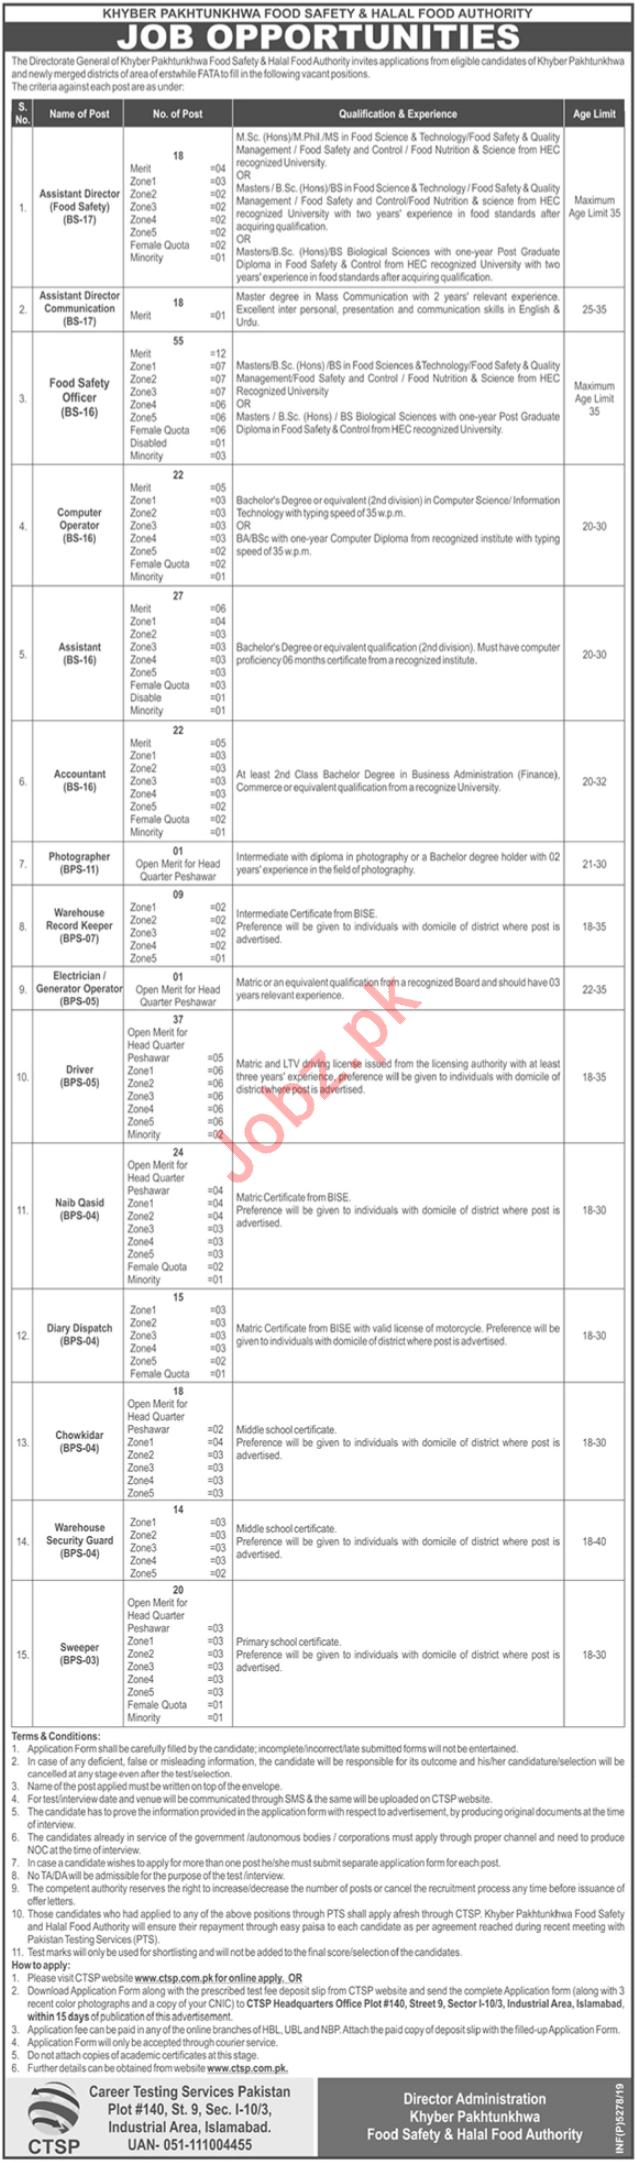 KPK Food Safety & Halal Food Authority Jobs 2020 Via CTSP